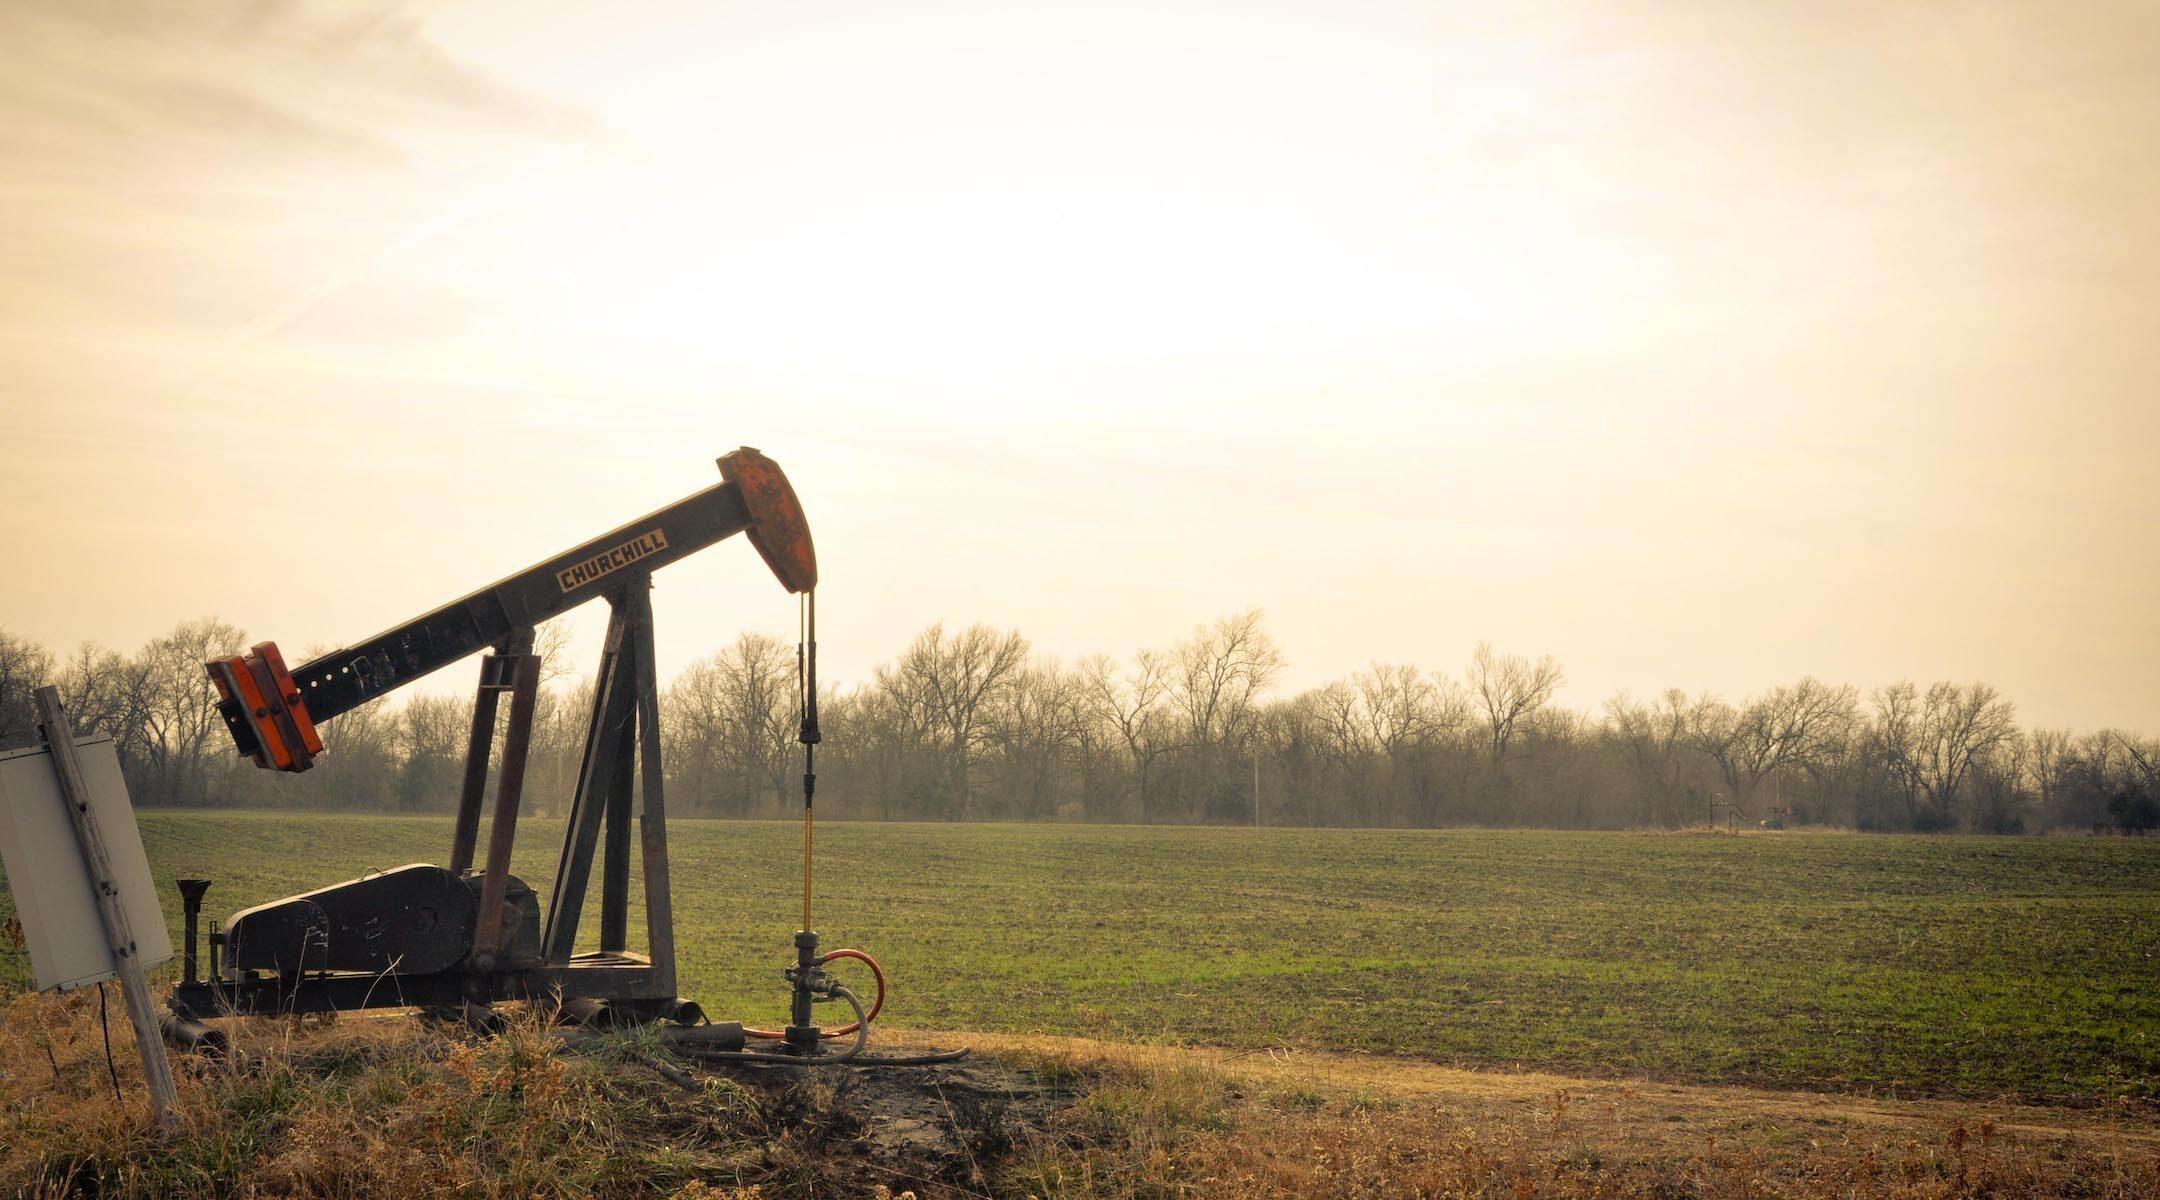 An oil derrick near farm fields in Oklahoma. (Photo/JTA-Sarah Nichols-Flickr Commons)